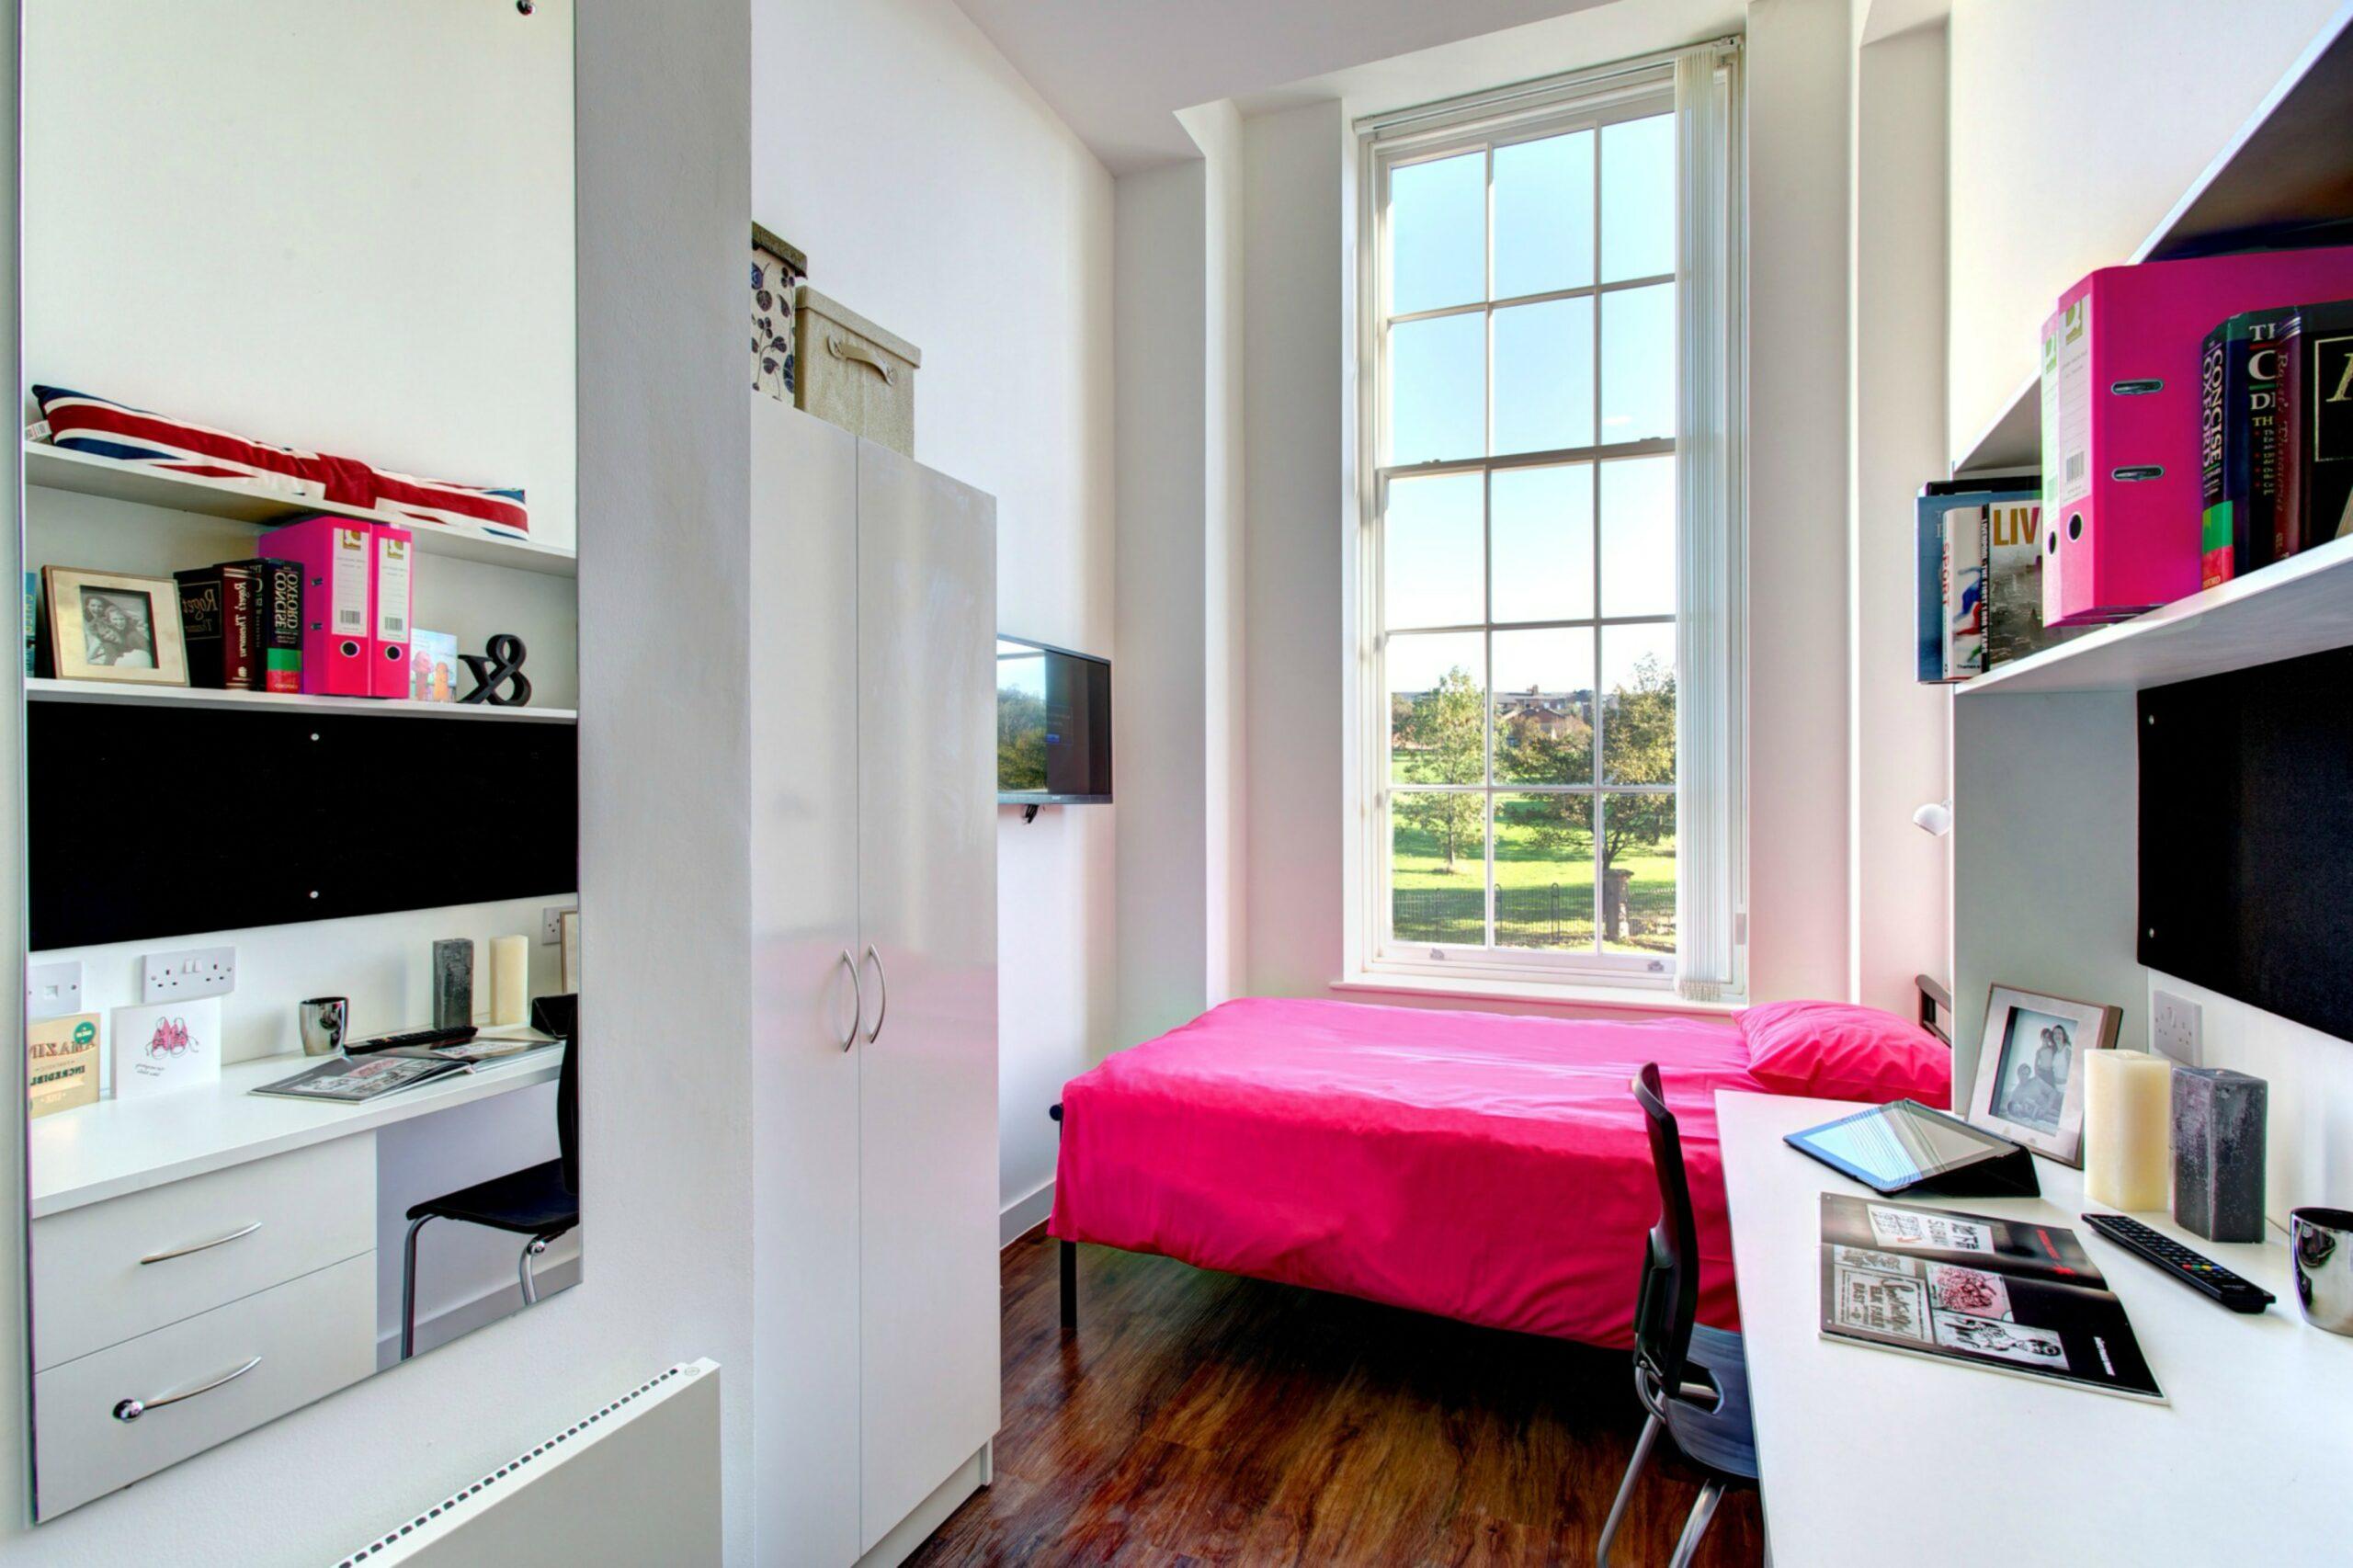 Student Studio Accommodation Bedroom